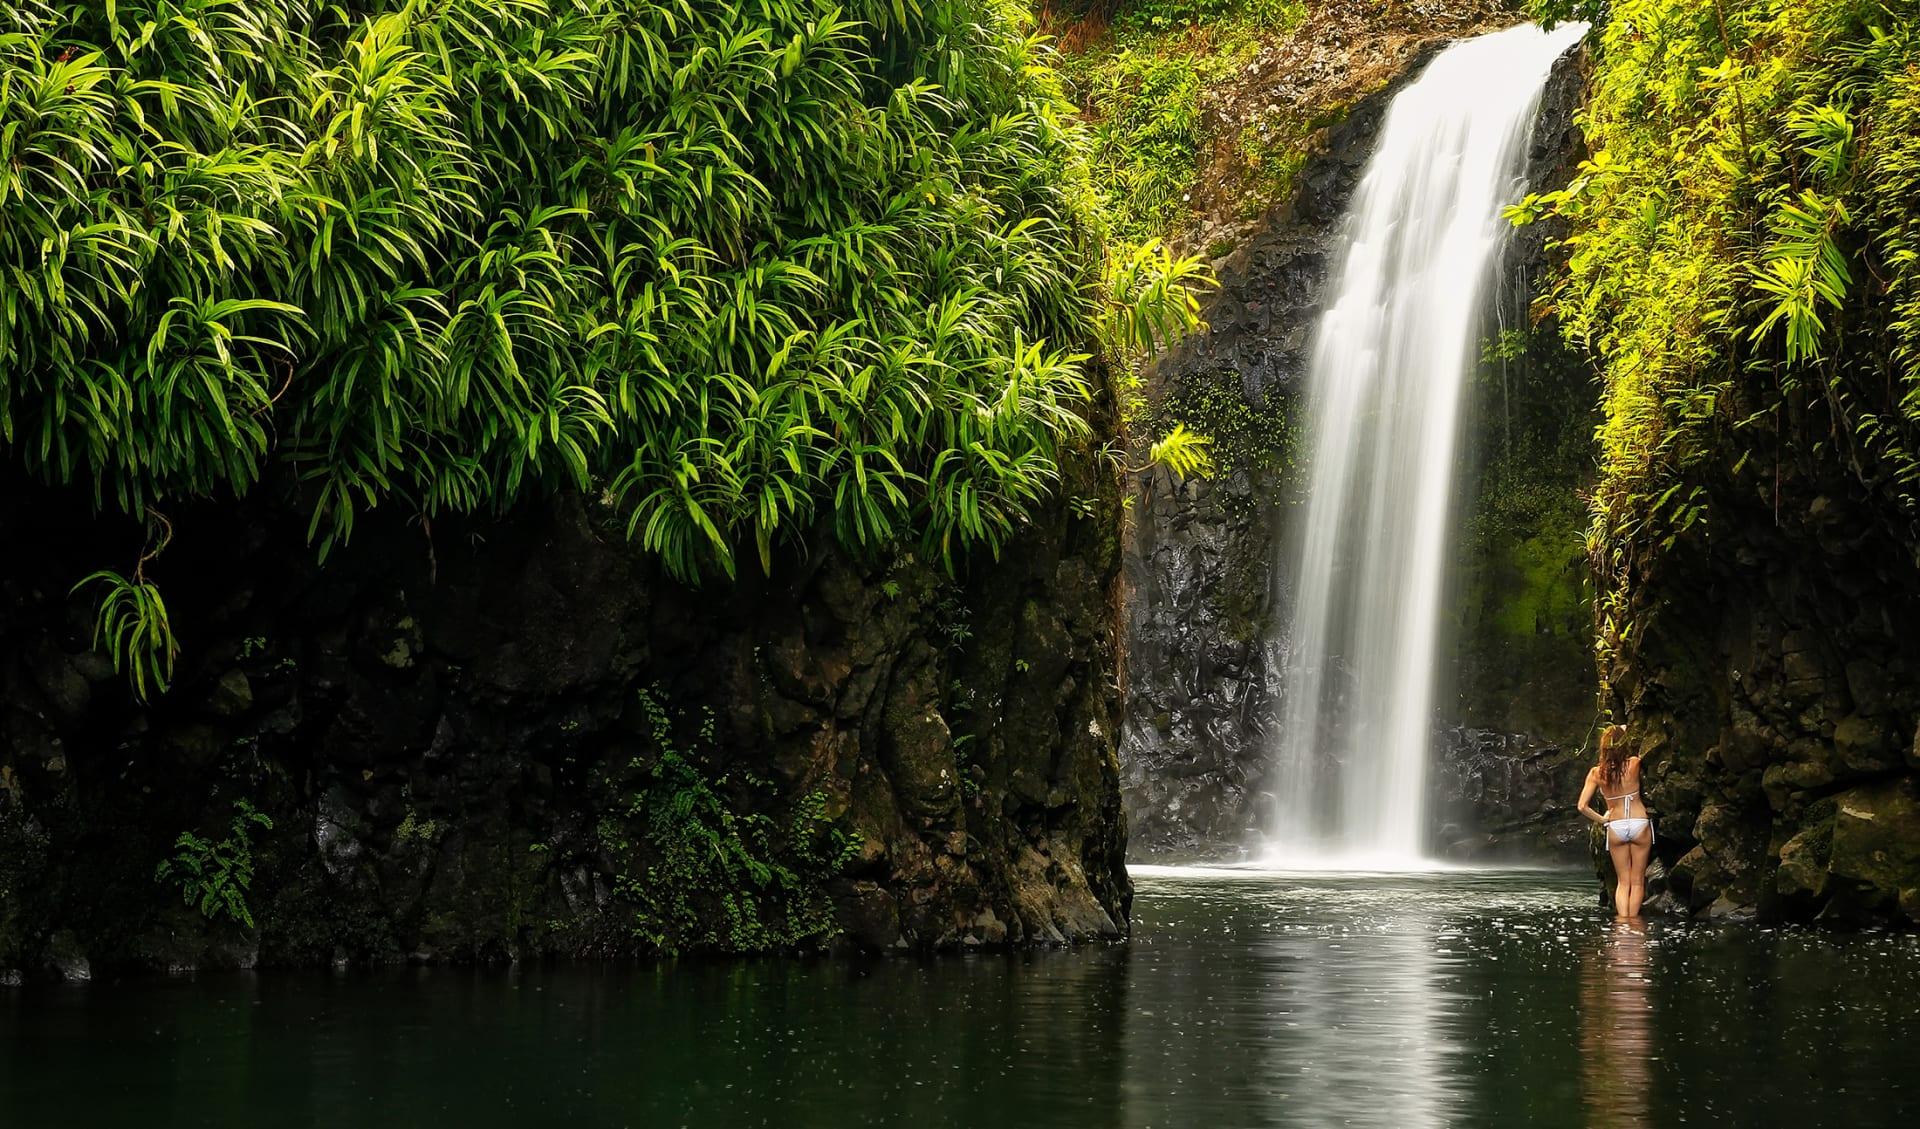 Wainibau Wasserfall, Taveuni, Fiji